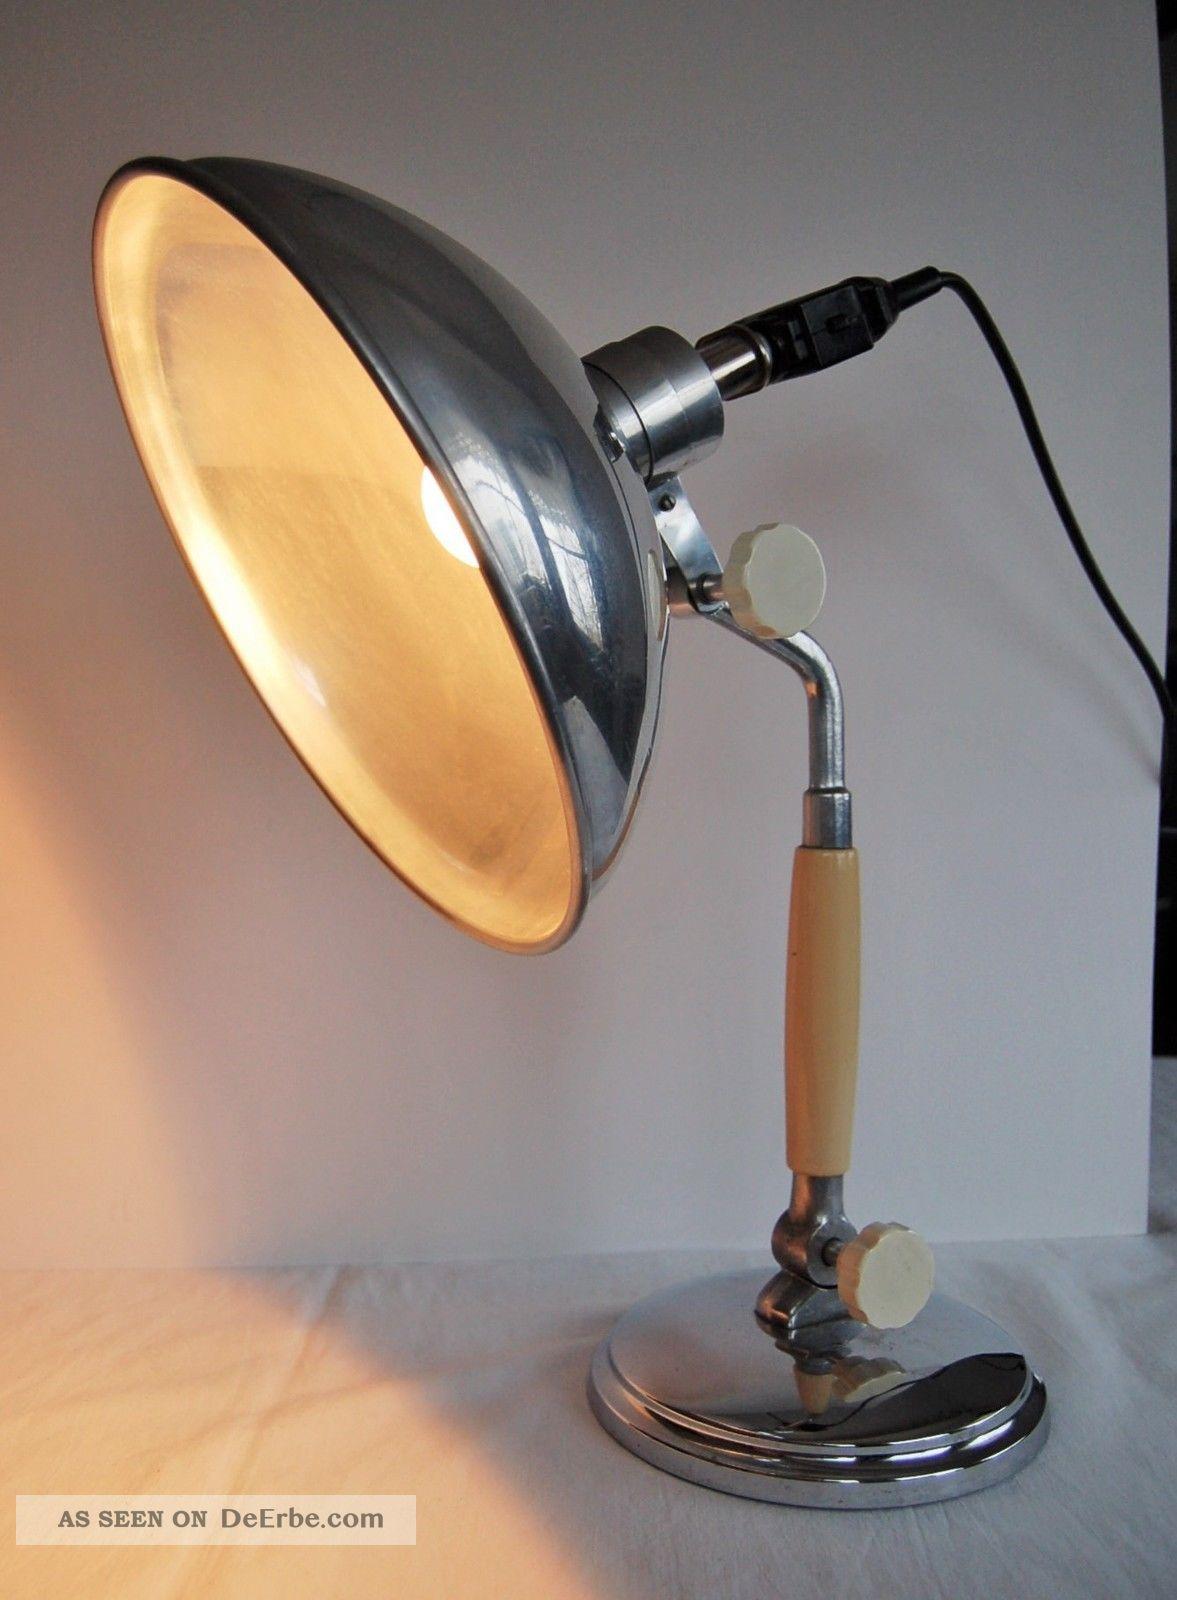 wandlampe industrie look wandlampe industrie look industrie wandlampe antik wandlampe. Black Bedroom Furniture Sets. Home Design Ideas